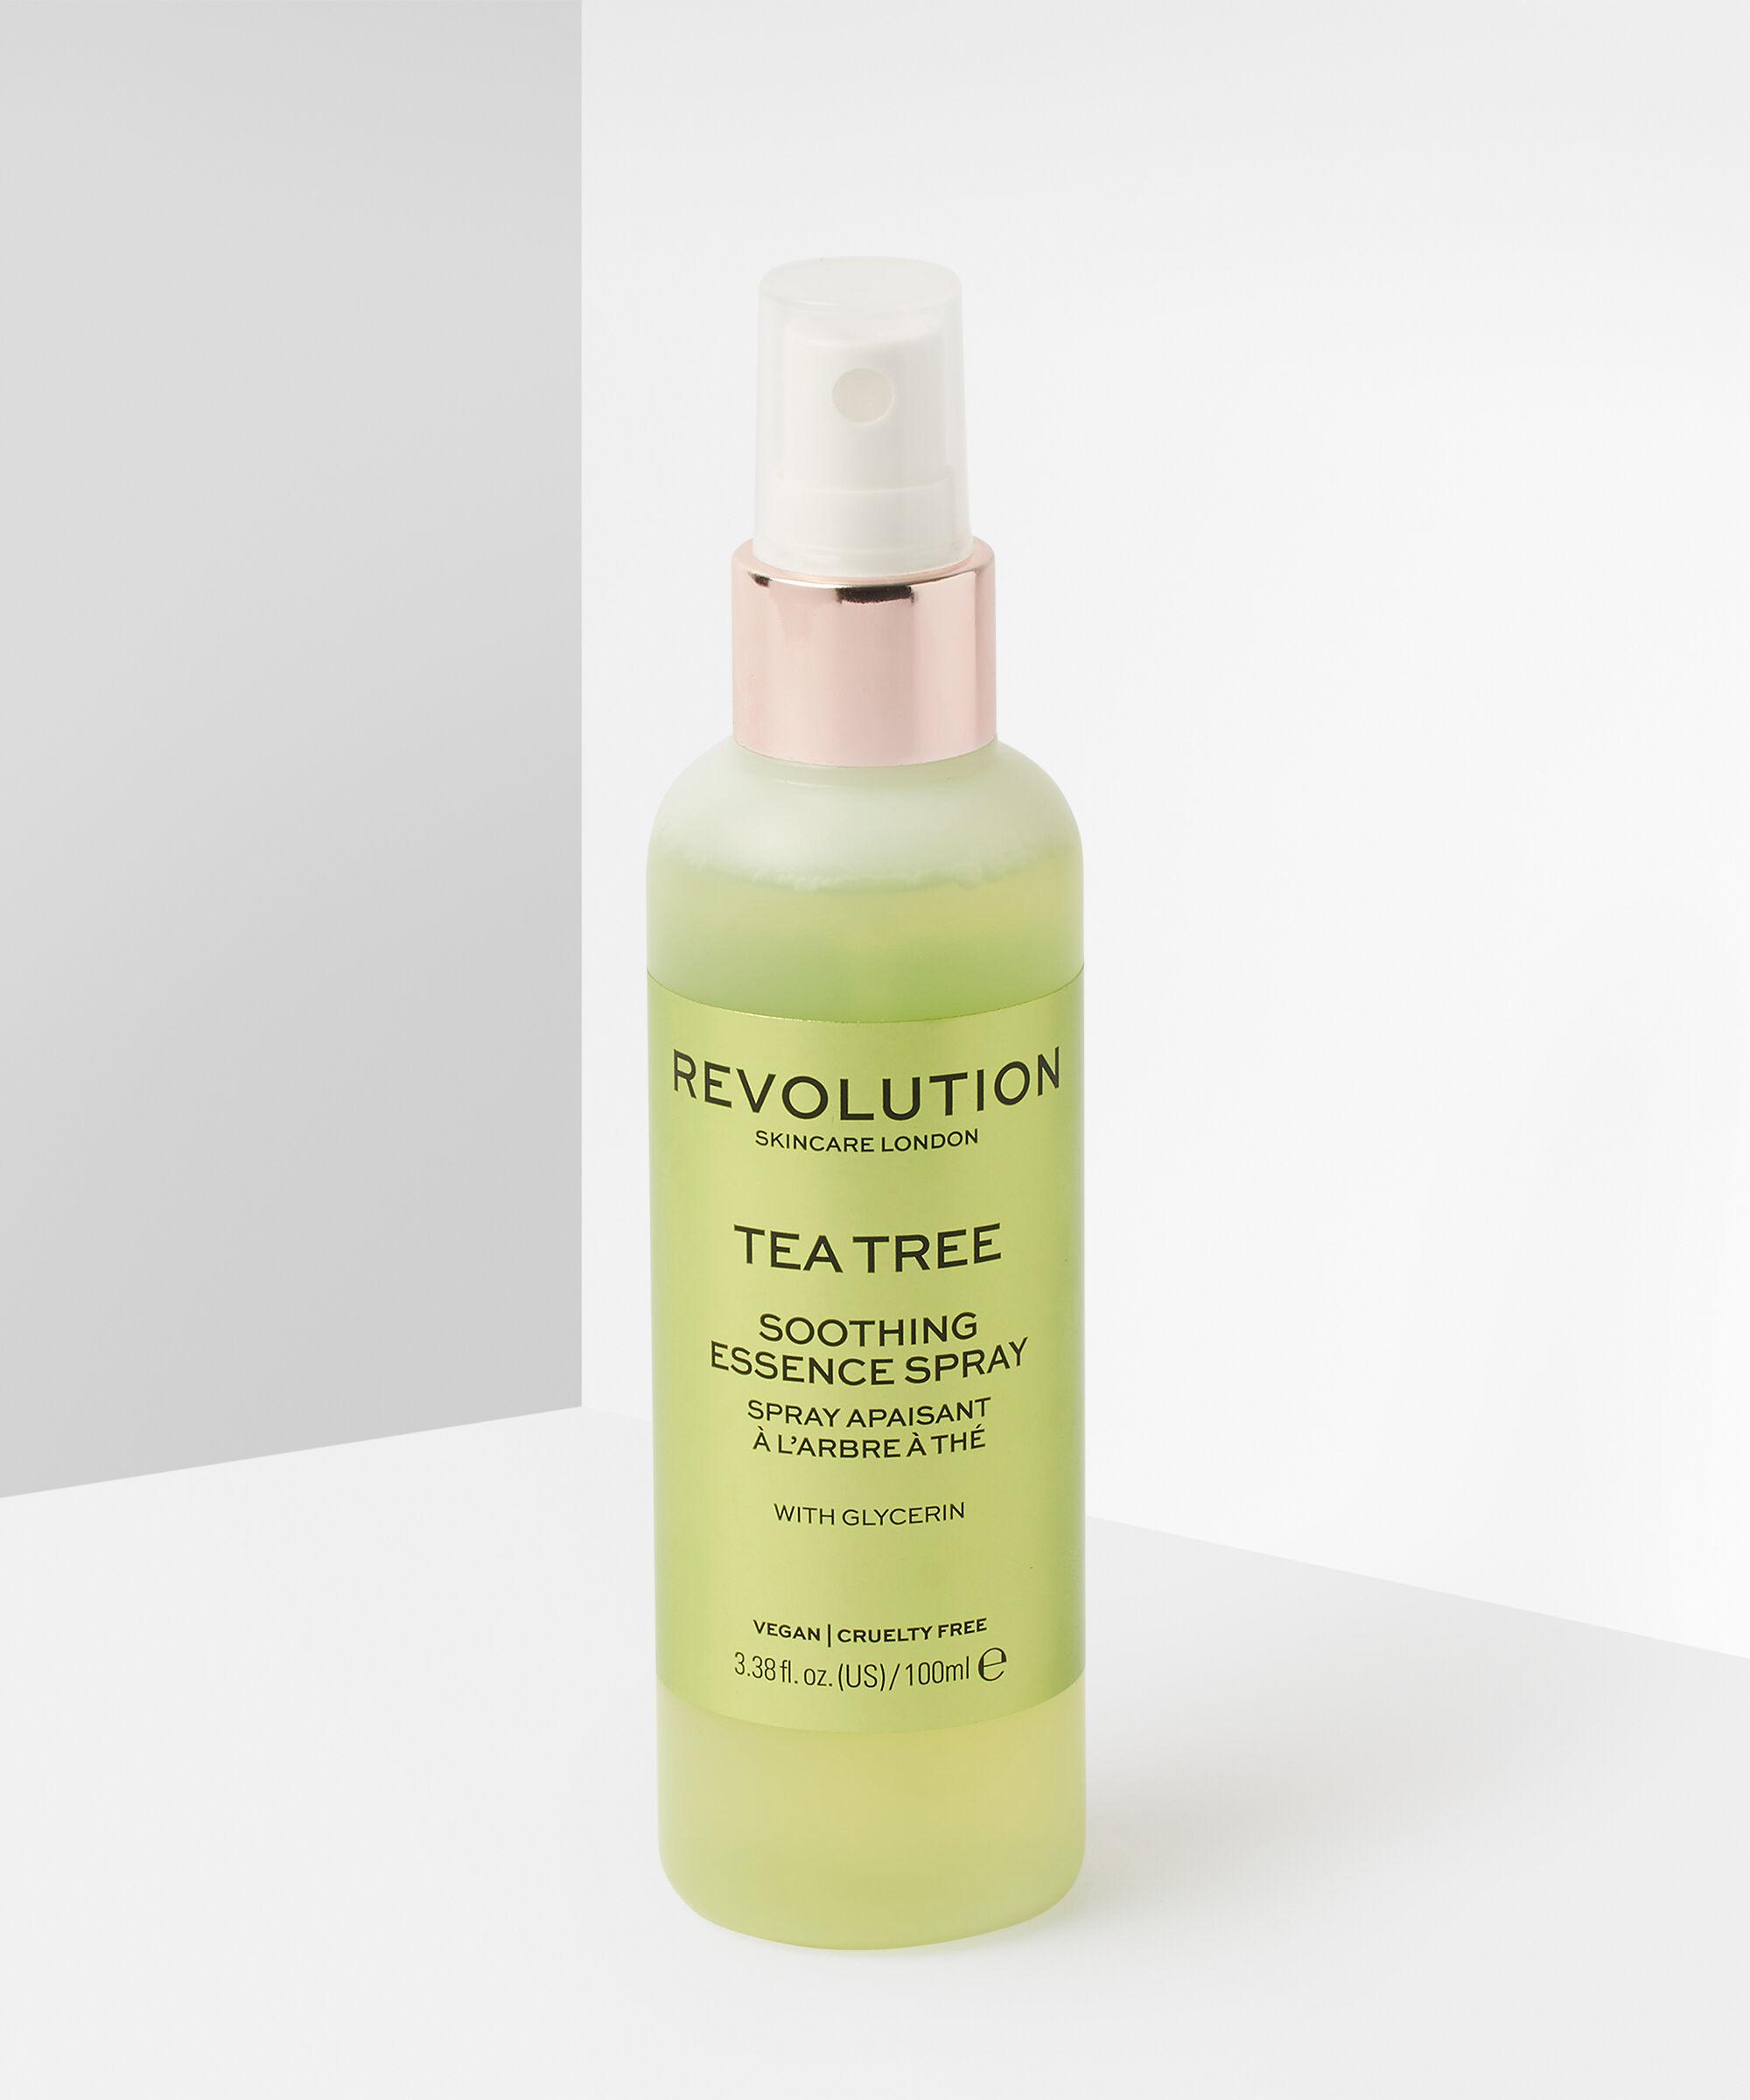 Revolution Skincare - Tea Tree Essence Spray